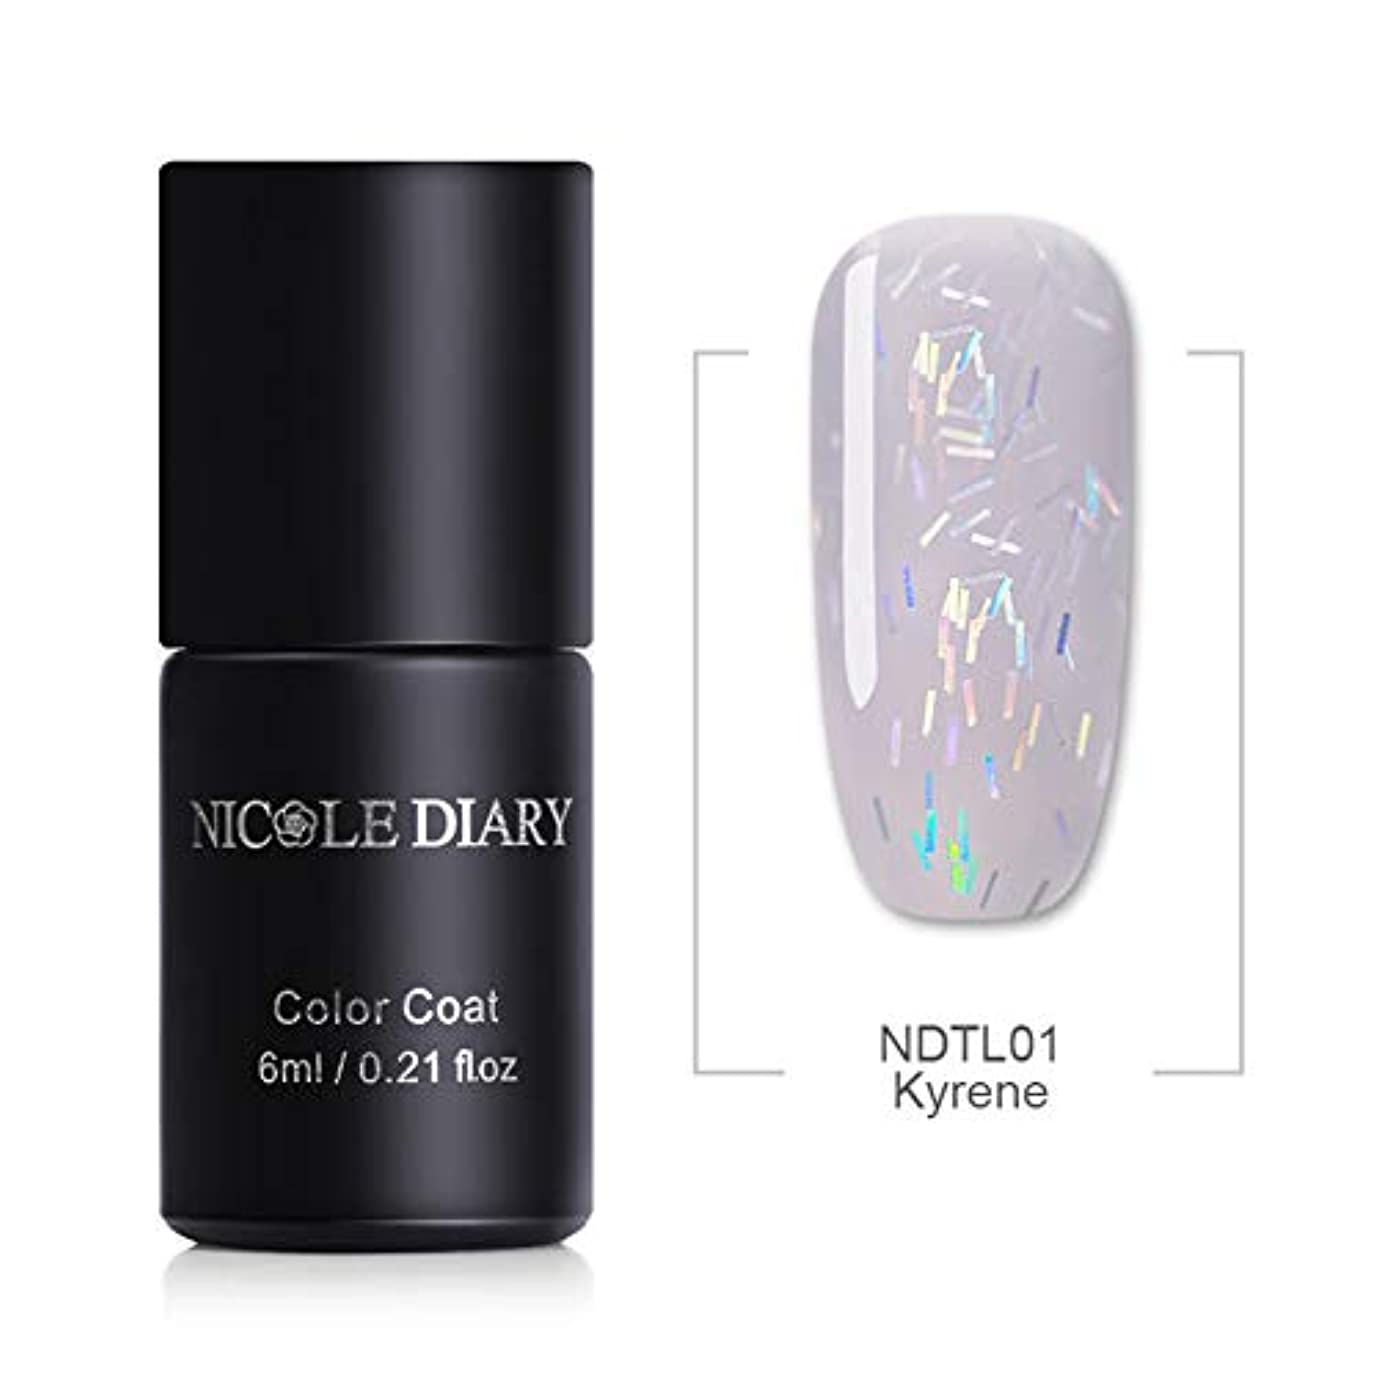 NICOLE DIARY グリッターゼリージェル 透け感 6ml レーザーラメ入り ゼリーのような透明感 UV/LED対応 6色 カラージェル ジェルネイル NDTL01 Kyrene [並行輸入品]